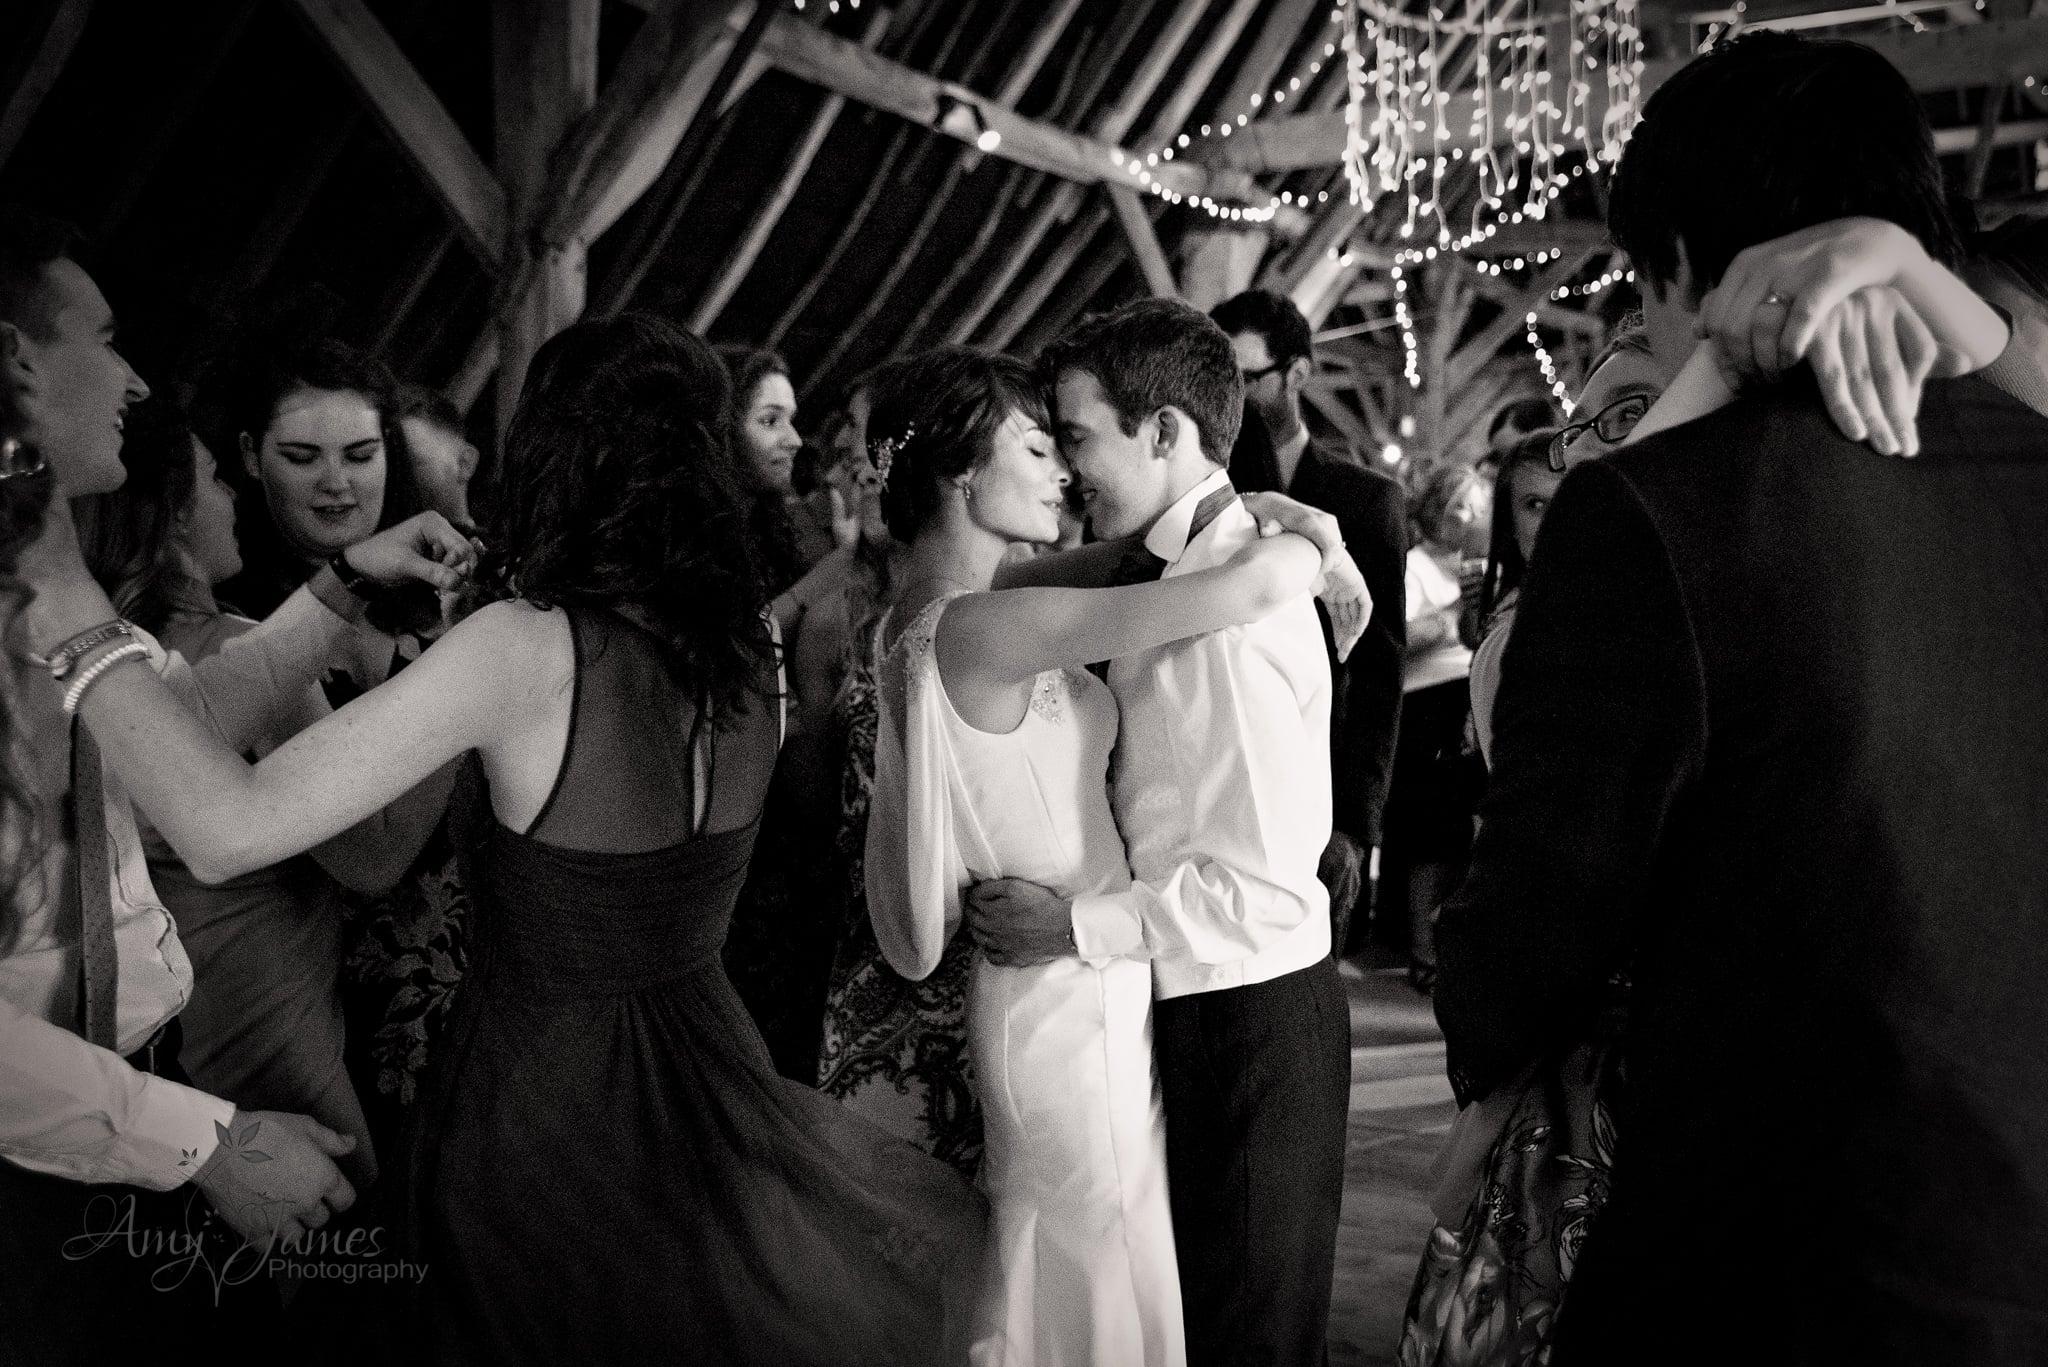 Hampshire wedding photographer / First dance / fleet wedding photographer / Barn wedding